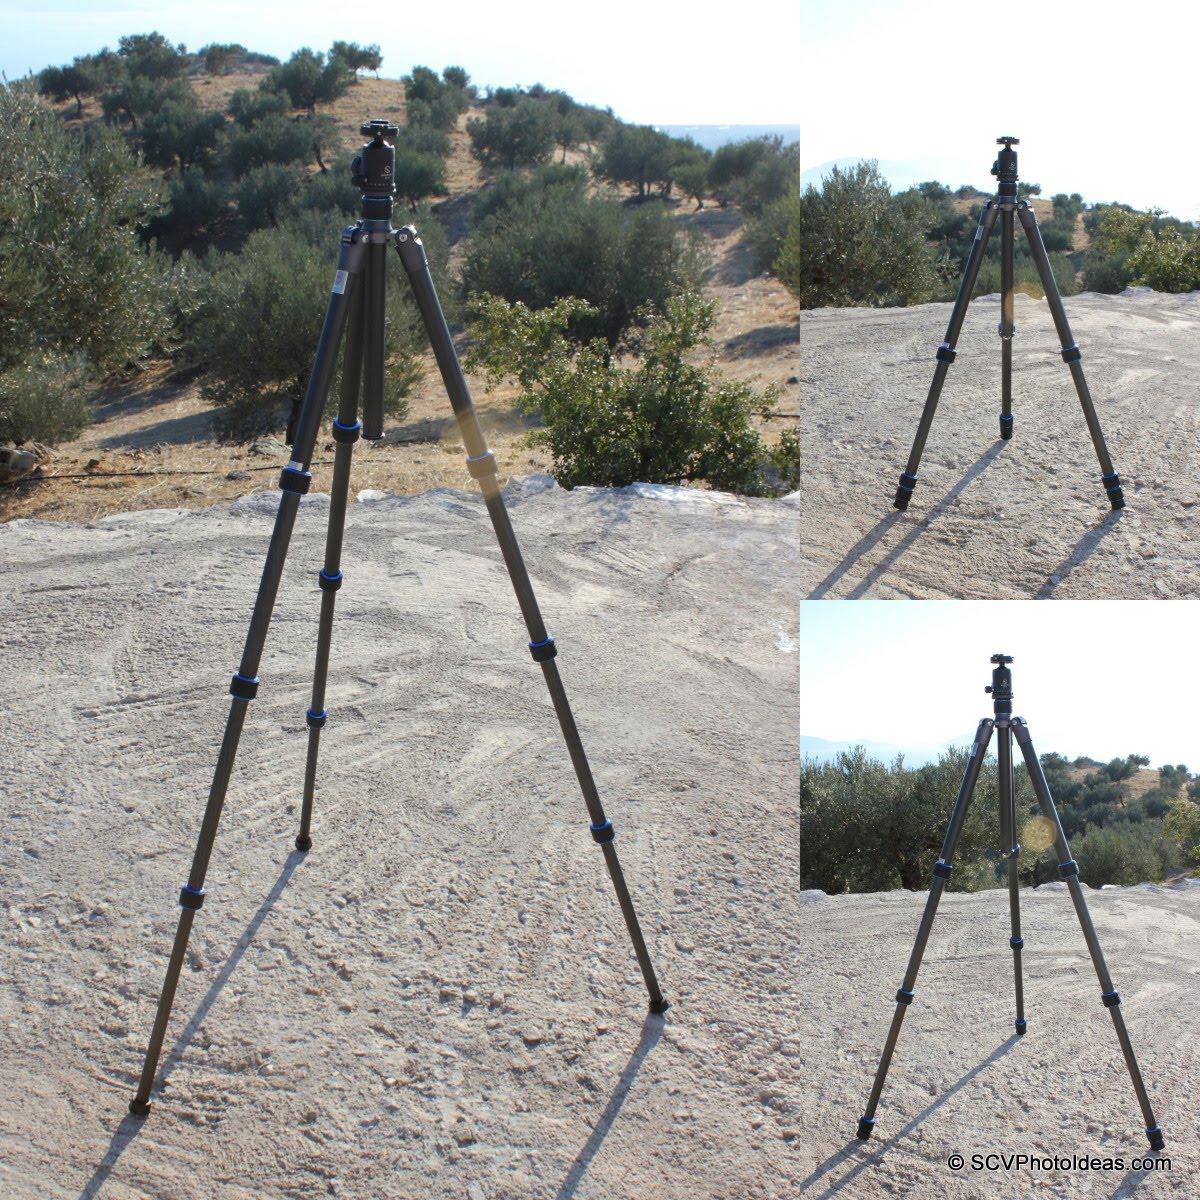 Nest NT-6294CT w/ Sunwayfoto DB-36DDH - long center column - 2 / 3 / 4 leg sections extended